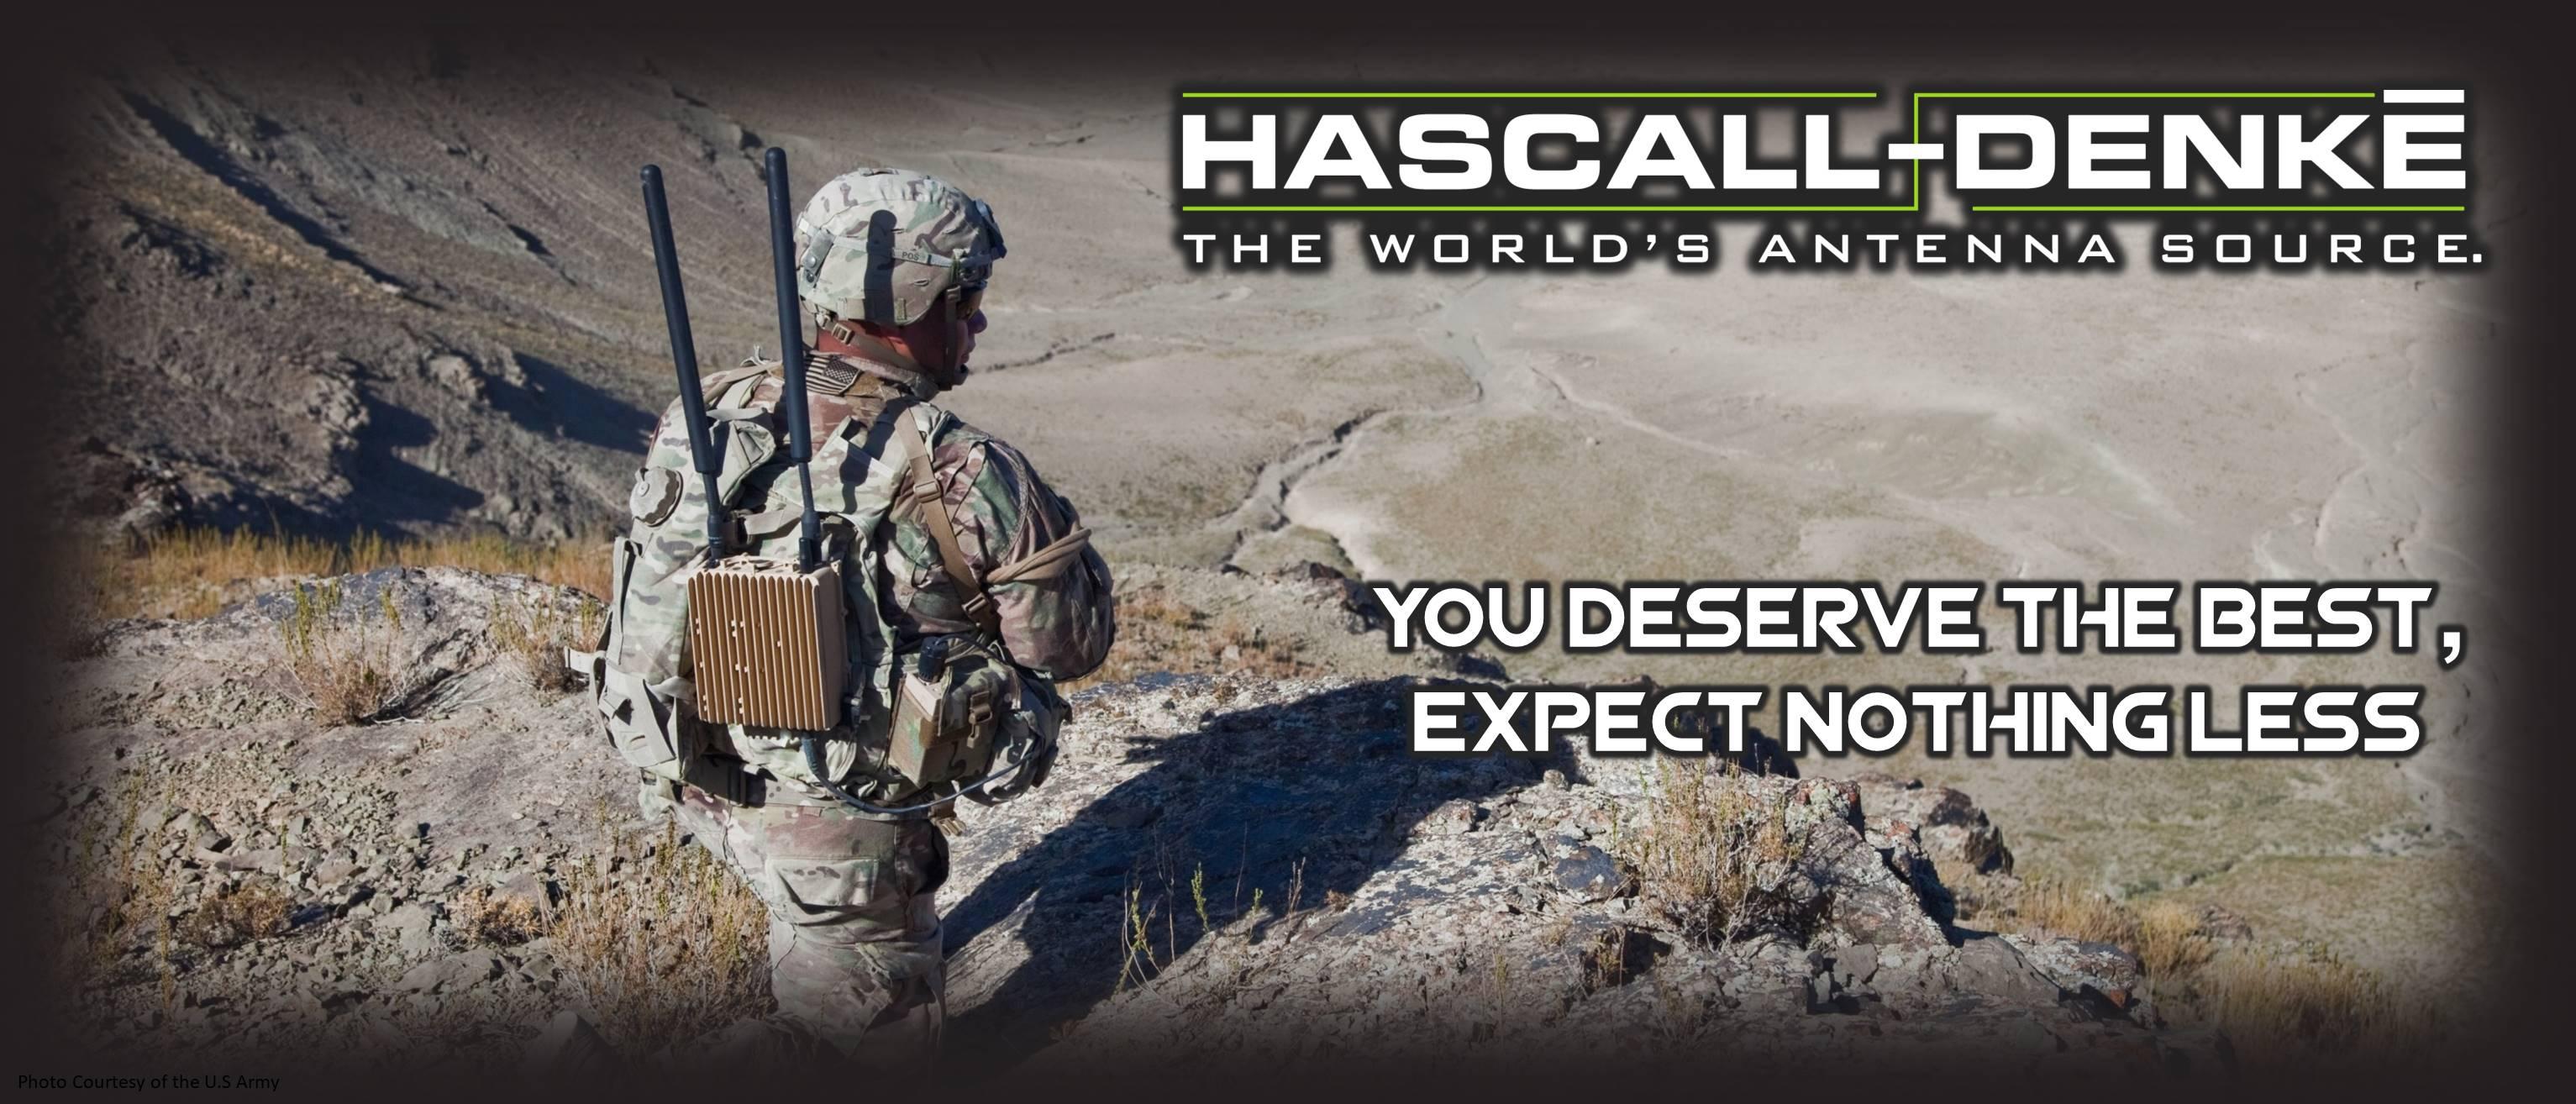 USA Military Antennas Manufacturer | HF VHF UHF L S C | Hascall-Denke